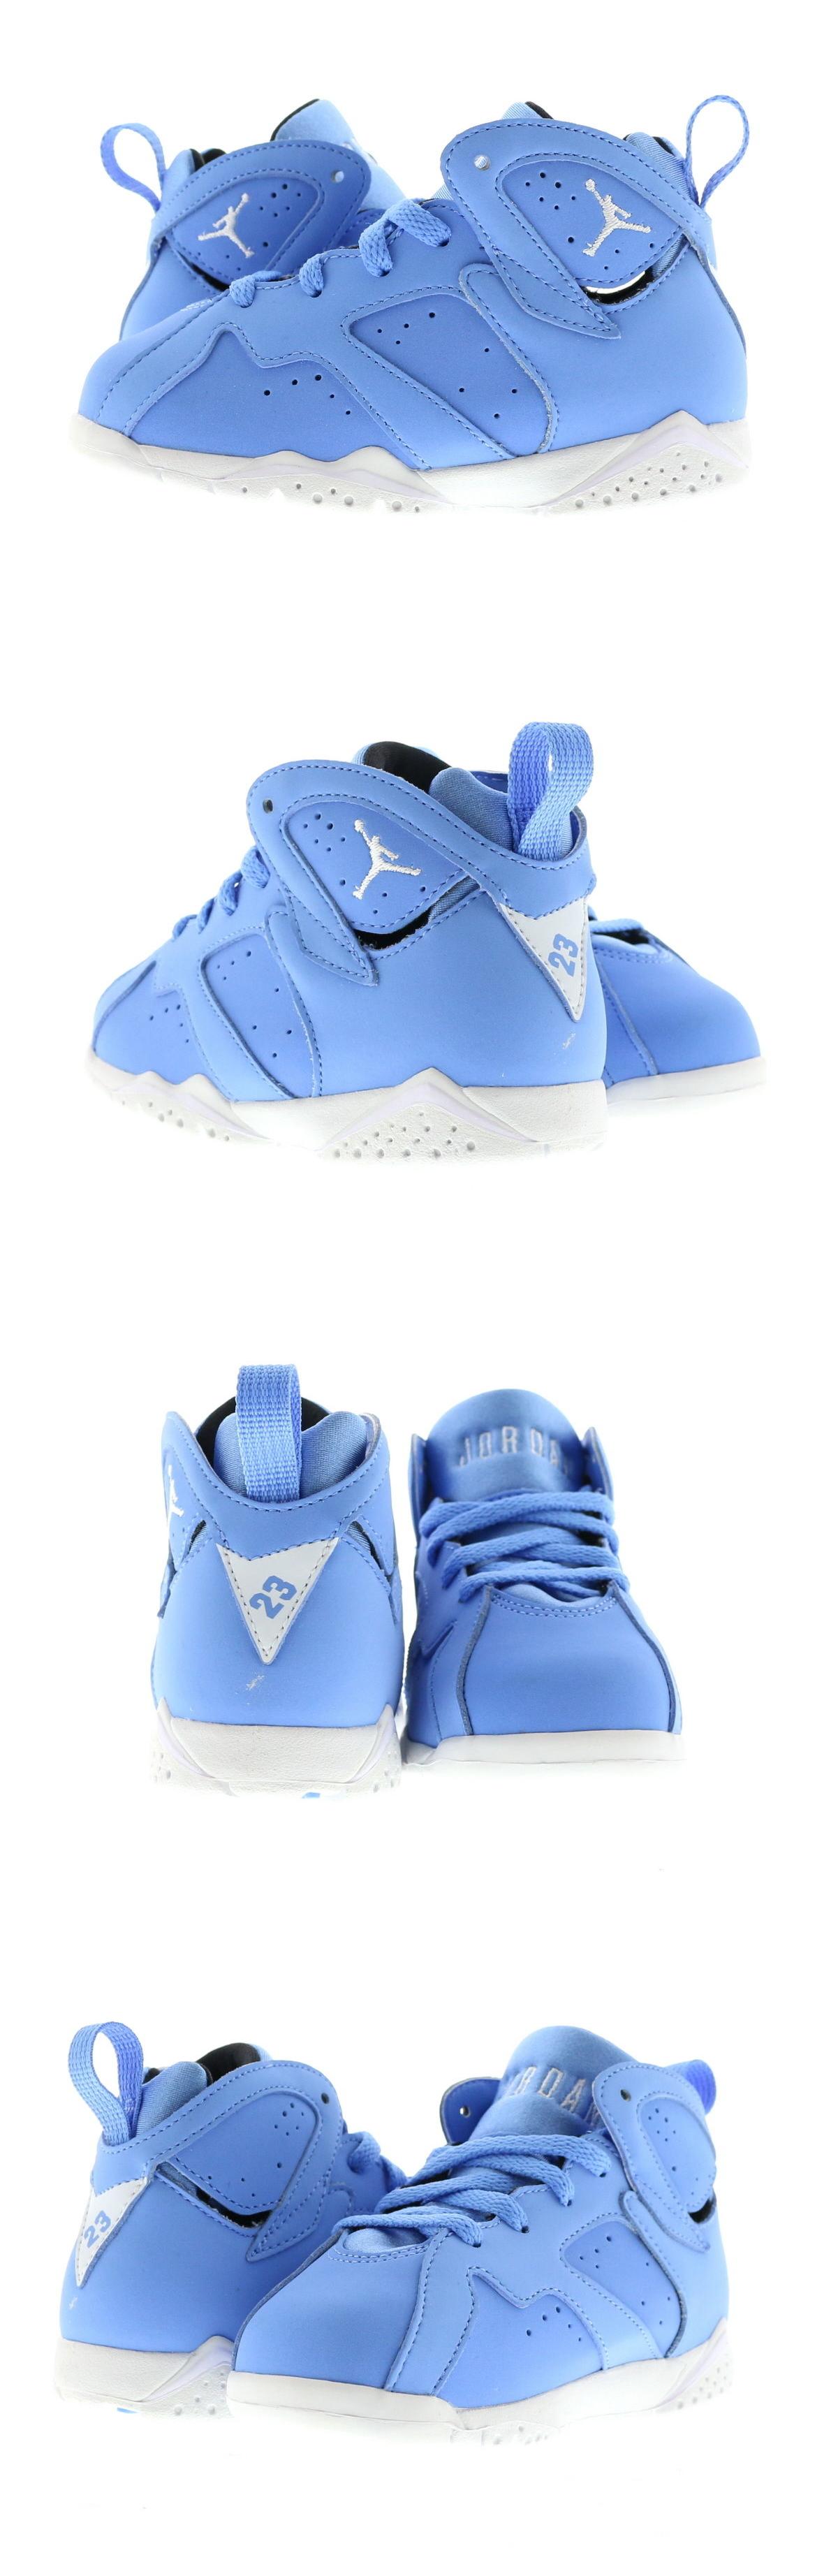 7df7cc90794c Baby Shoes 147285  Infant (Td) Air Jordan 7 Retro Pantone University Blue  White 304772-400 -  BUY IT NOW ONLY   45 on eBay!